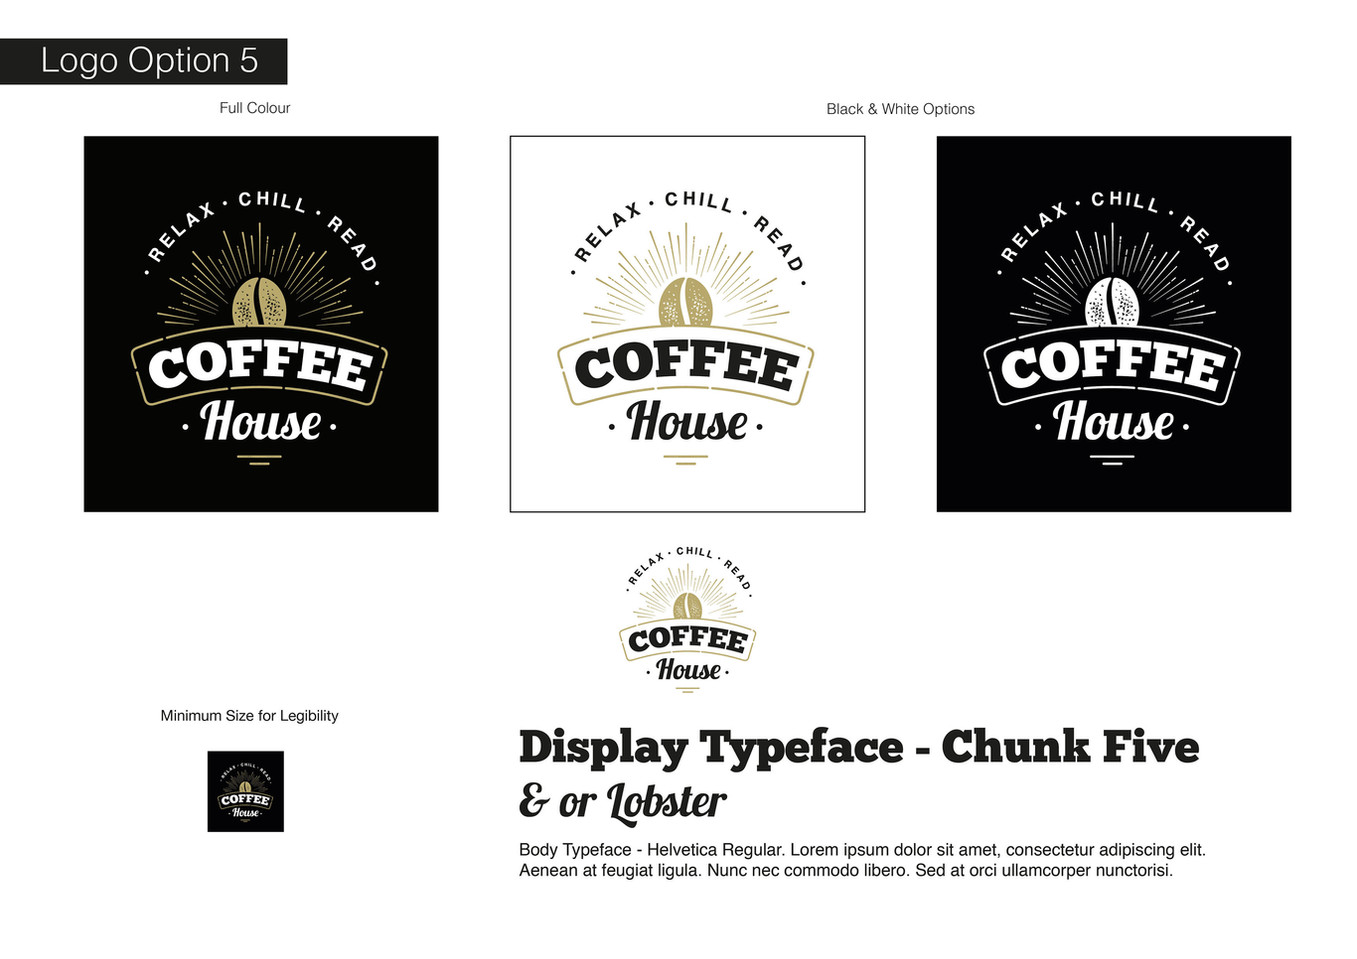 Coffee House Visual Identity - Development 5